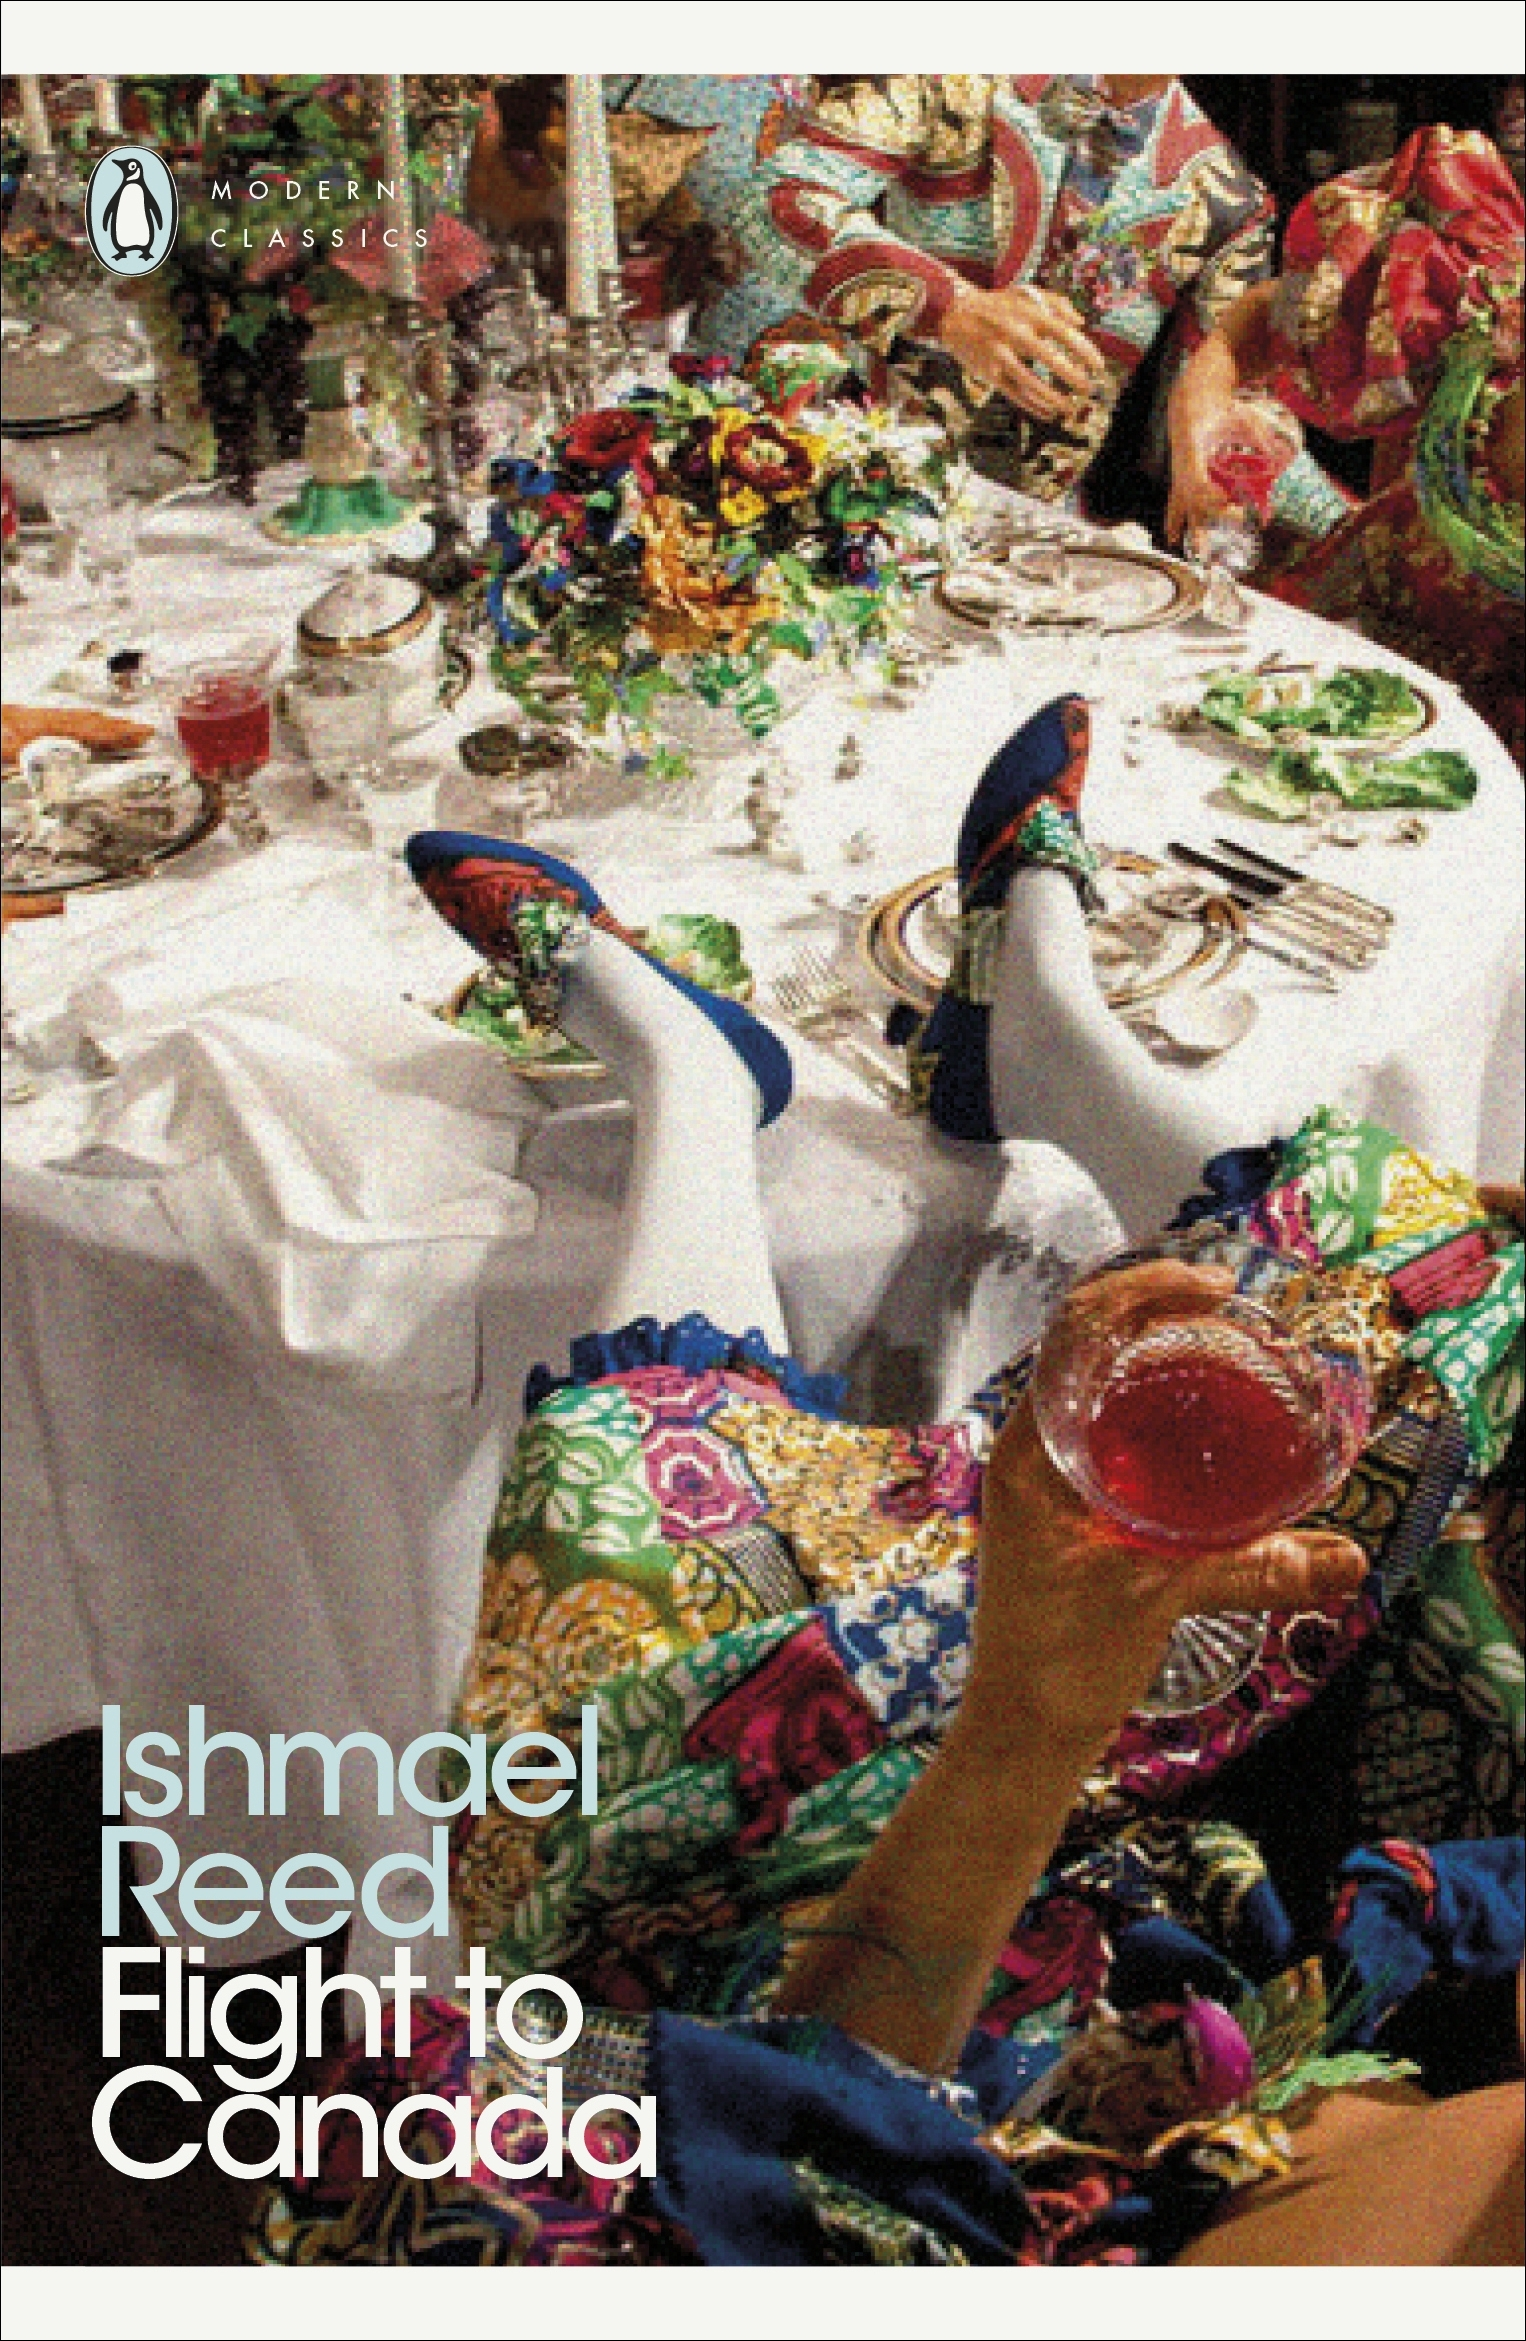 Flight to Canada by Ishmael Reed - Penguin Books Australia